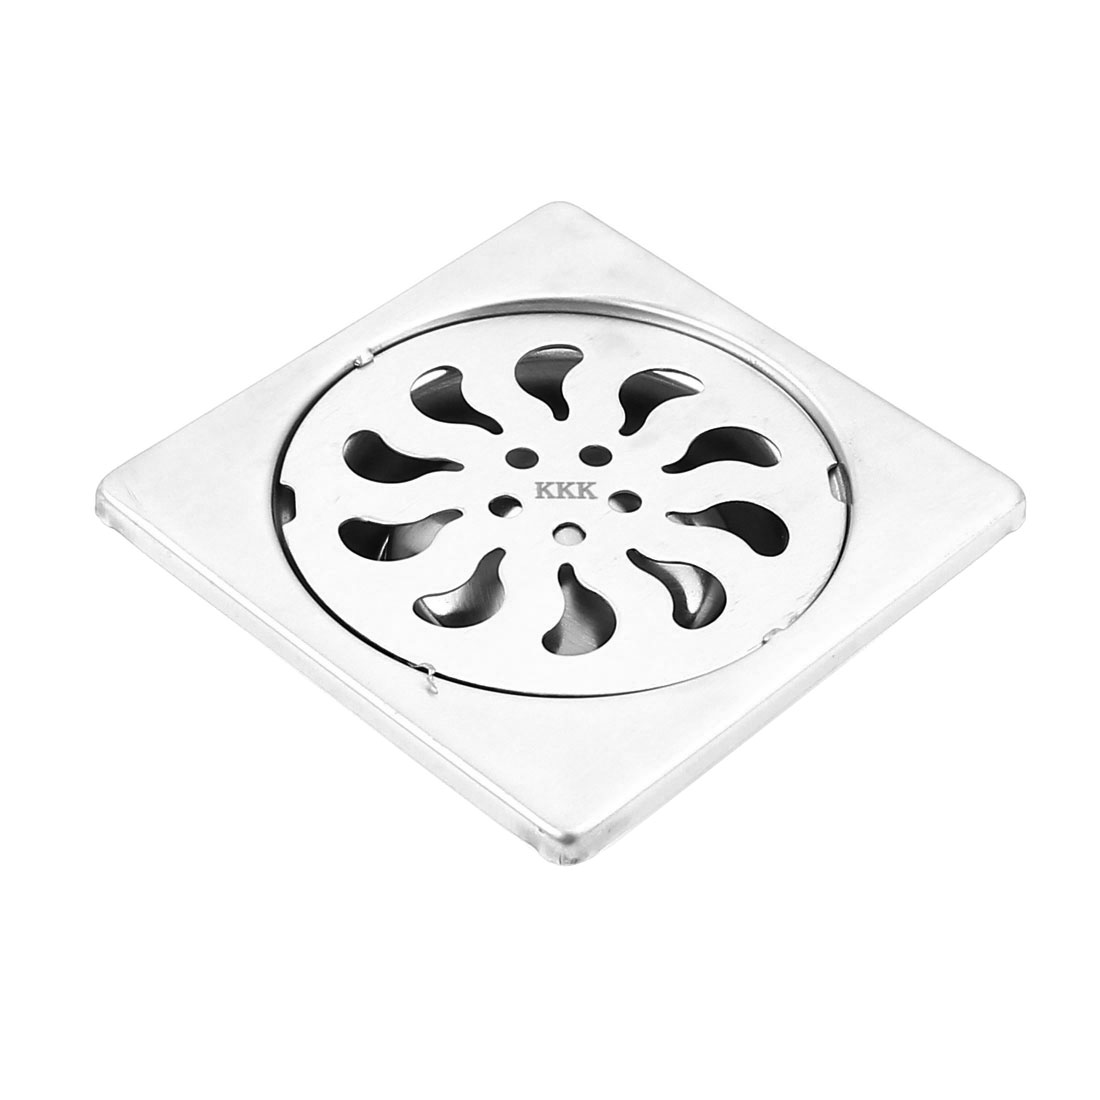 Bathroom Shower Floor Drain Strainer Sink 90x90x30mm Silver Tone